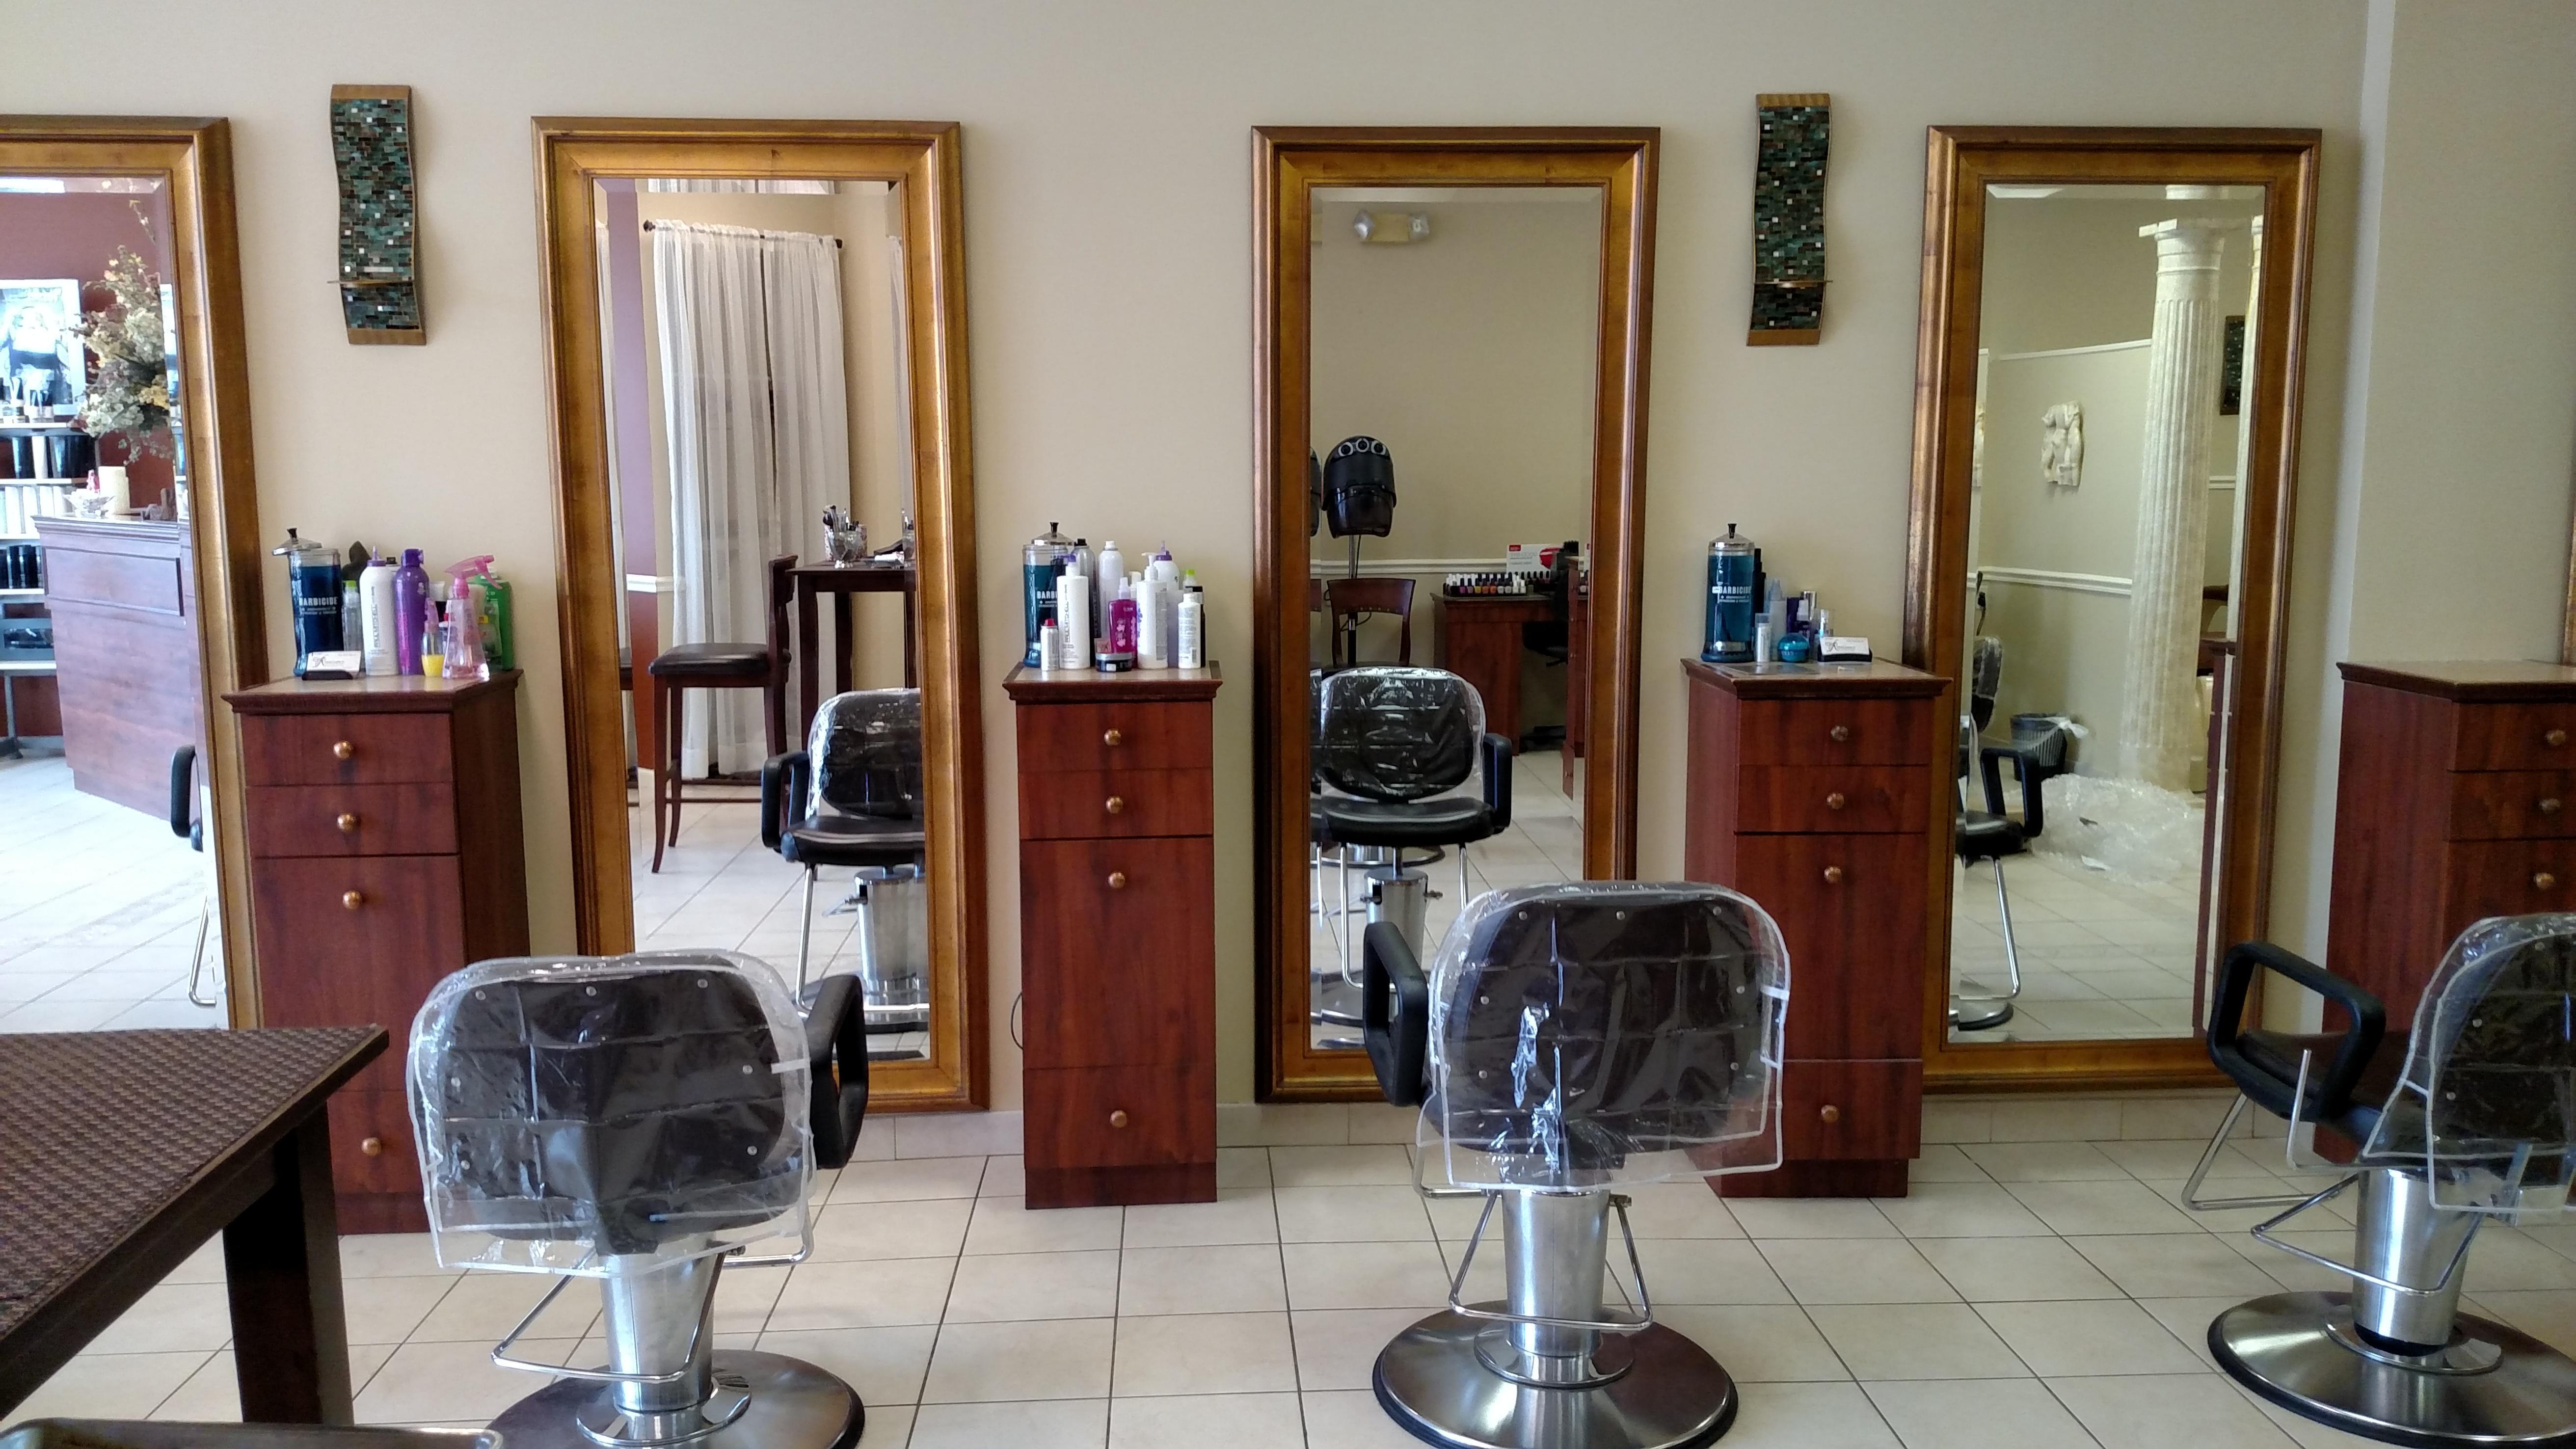 Renaissance Salon & Spa 4057 Asbury Ave Tinton Falls, NJ Hair Salons ...